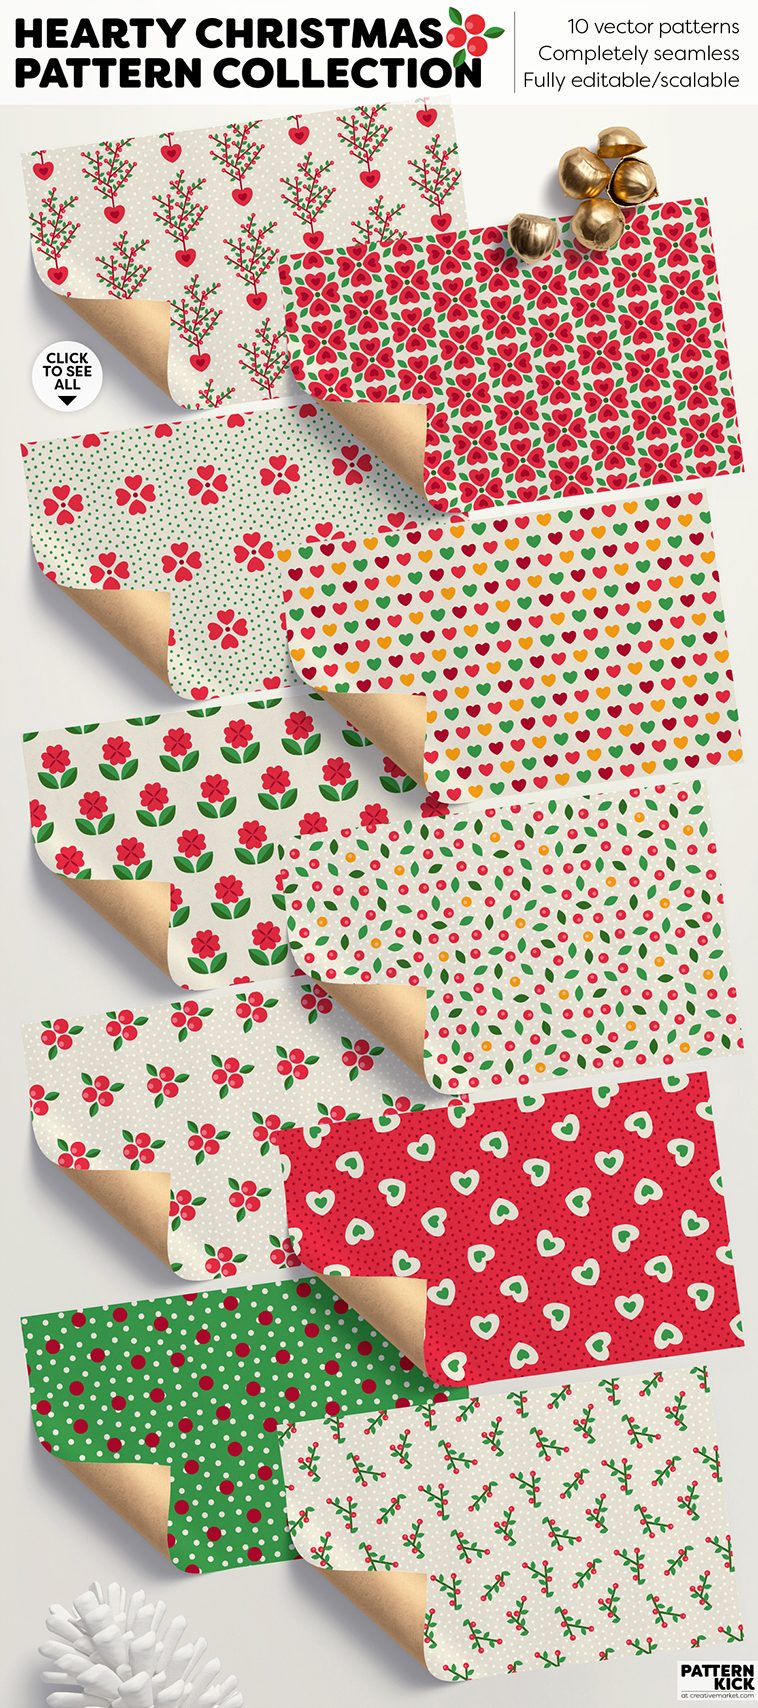 Christmas Prints and Patterns at Pattern Kick - Creative Market [3] | Pitter Pattern